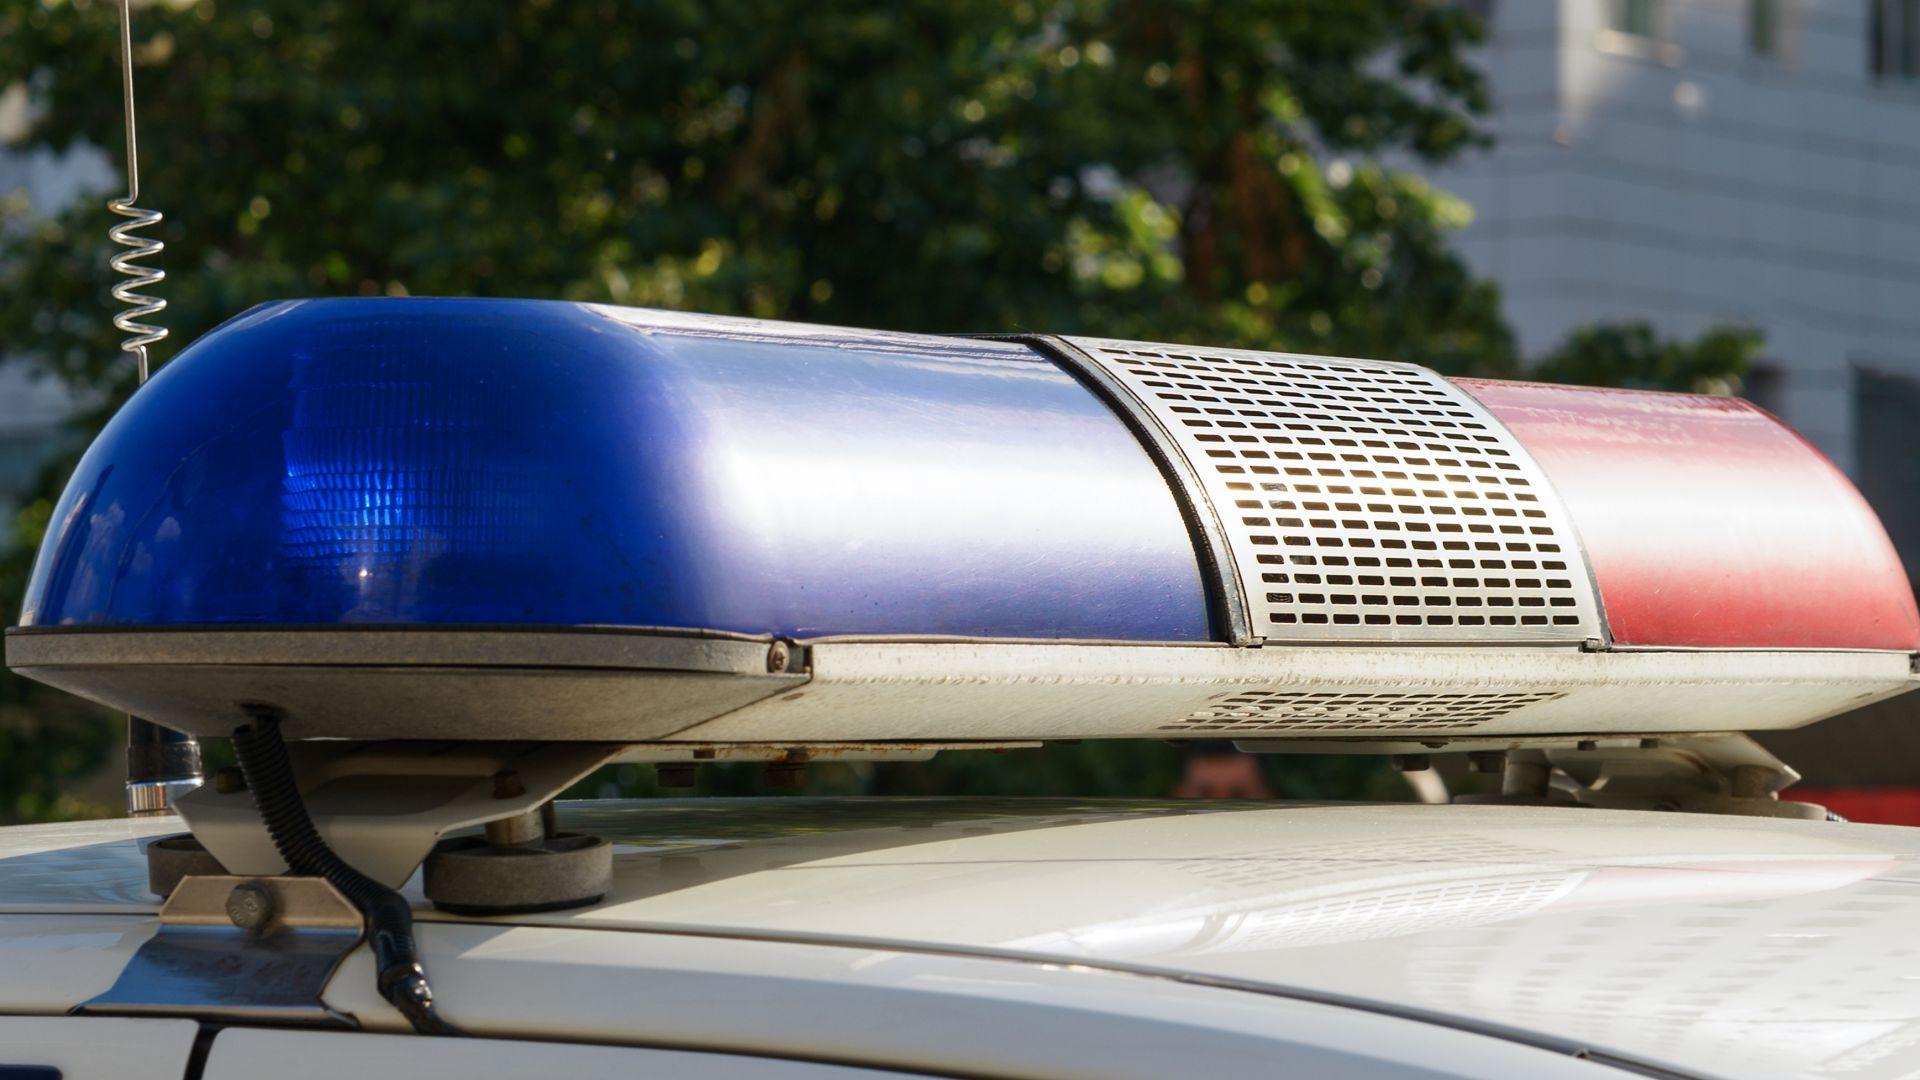 Трима ранени при удар между такси и маршрутка